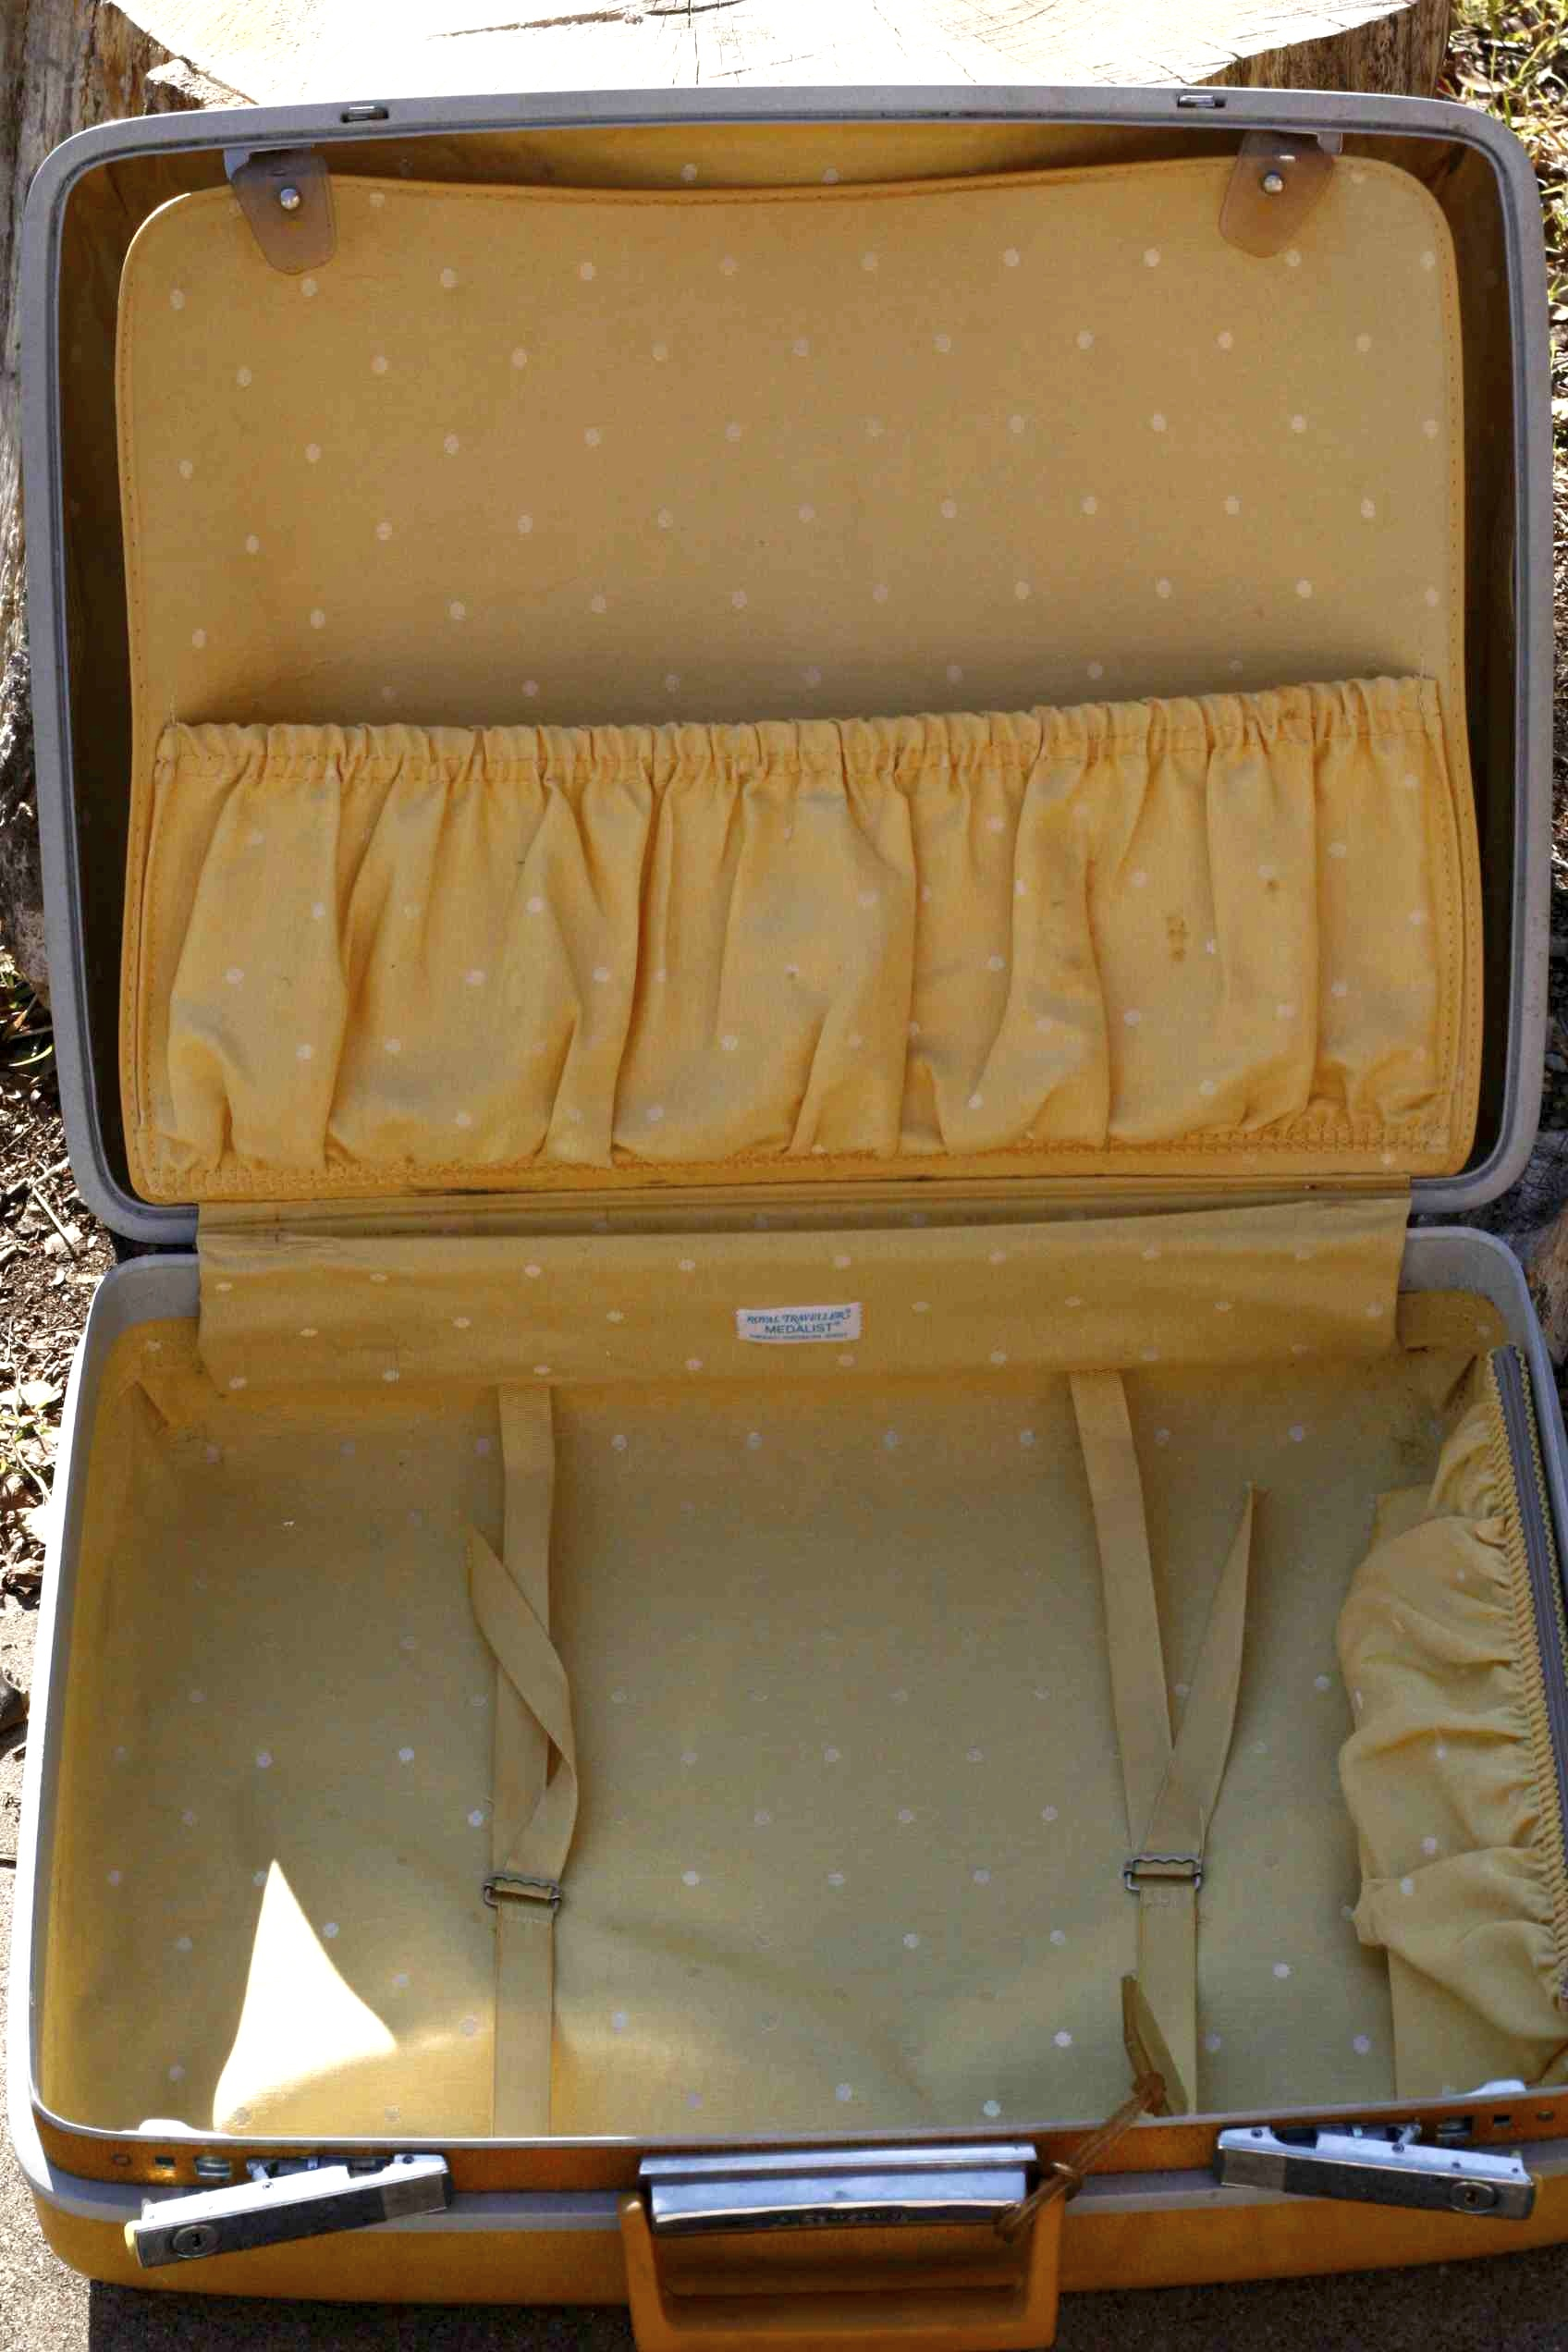 Vintage Samsonite Suitcase // Jet Set Cool! | Fort Worth Vintage